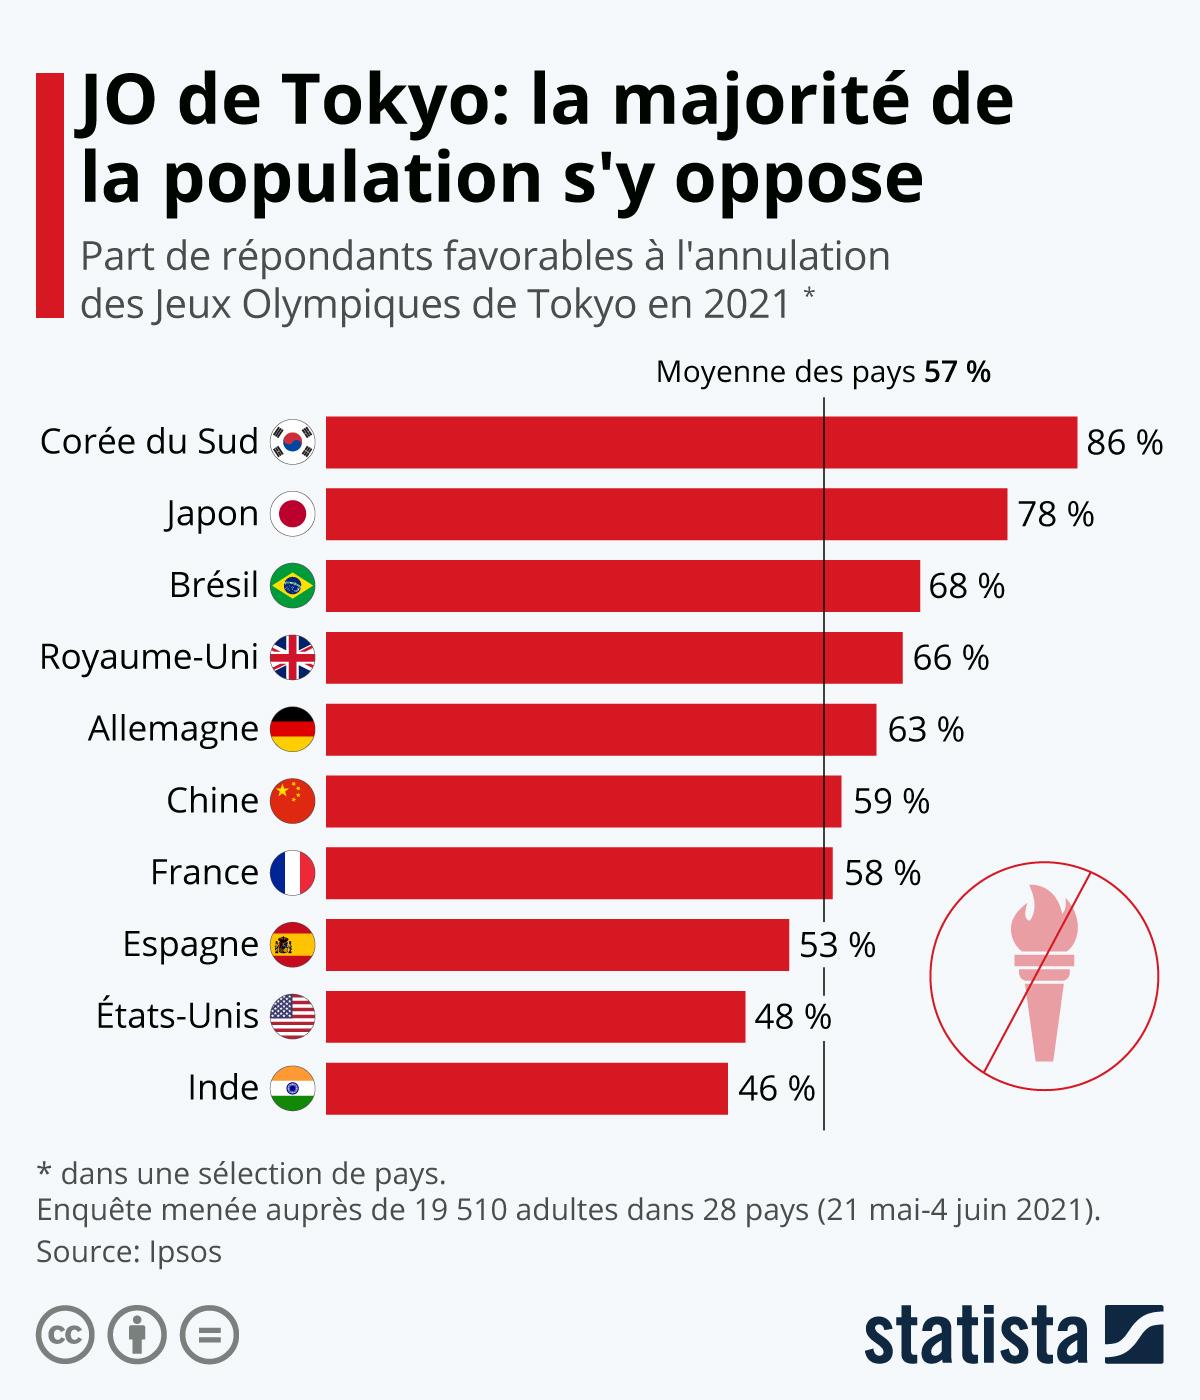 Infographie: Les impopulaires JO de Tokyo   Statista